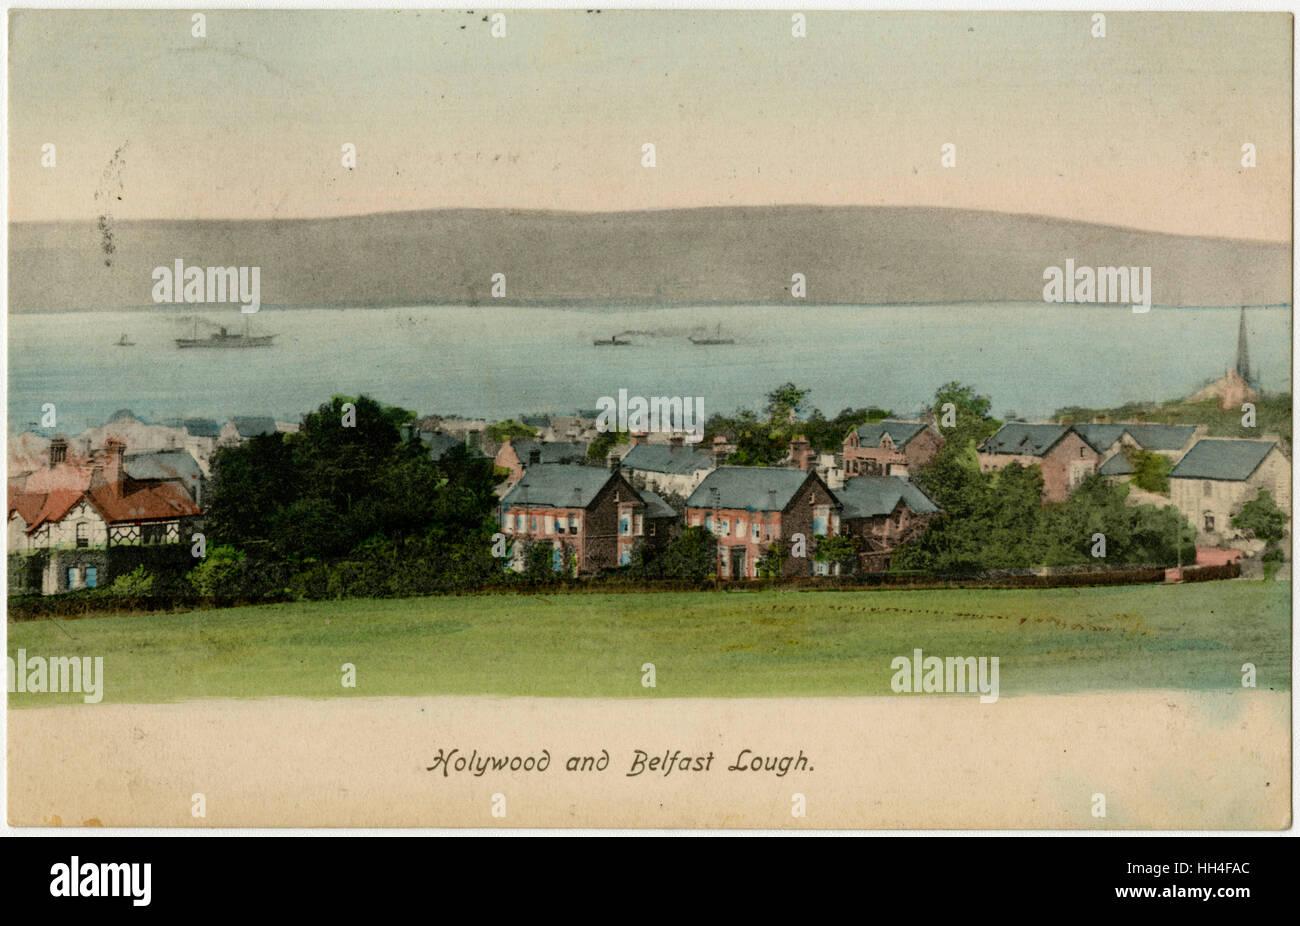 Holywood and Belfast Lough, Northern Ireland - Stock Image